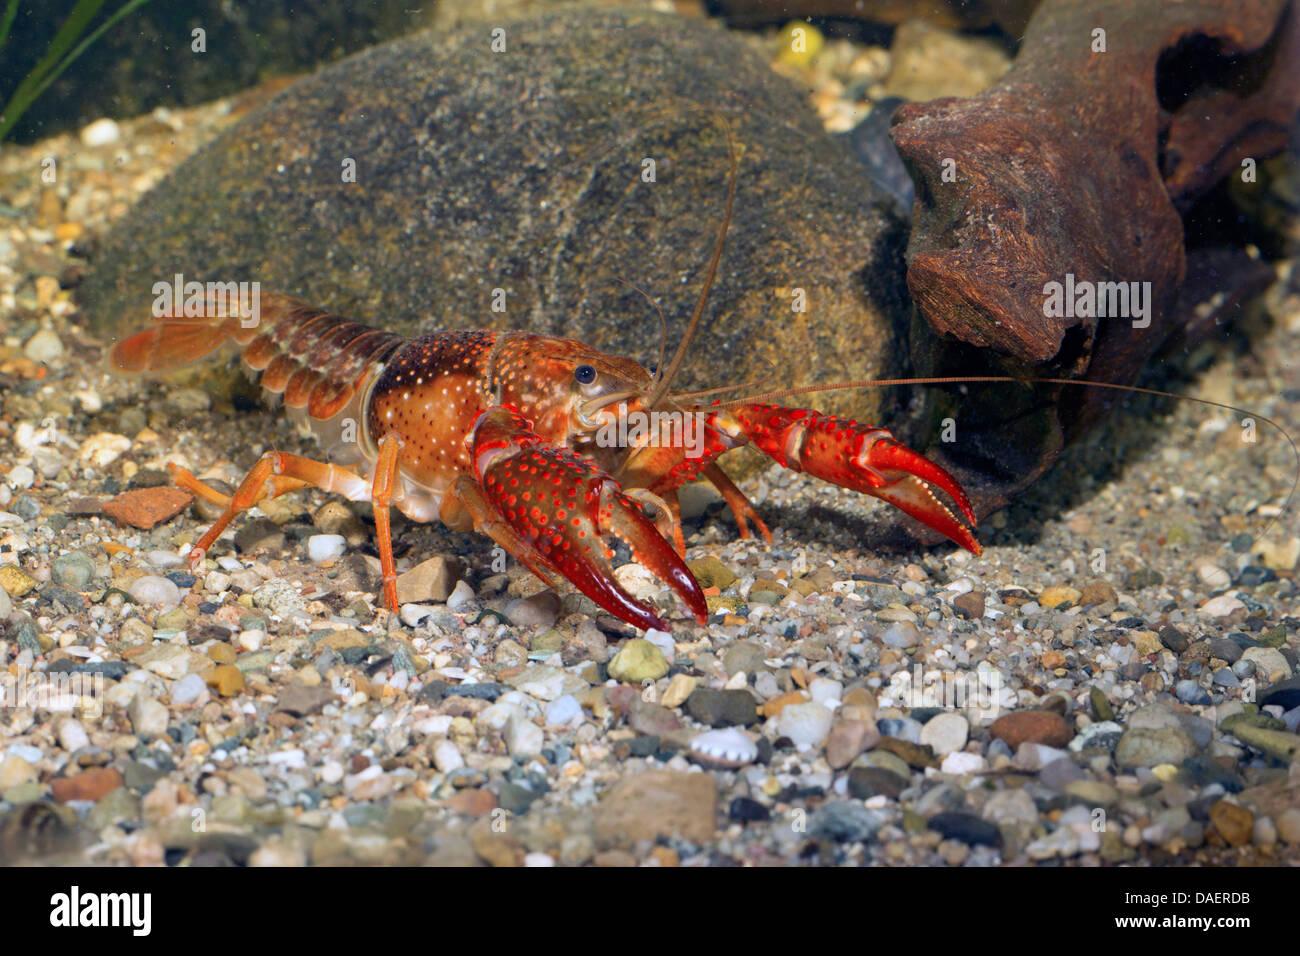 Louisiana red crayfish, red swamp crayfish, Louisiana swamp crayfish, red crayfish (Procambarus clarkii), male, - Stock Image